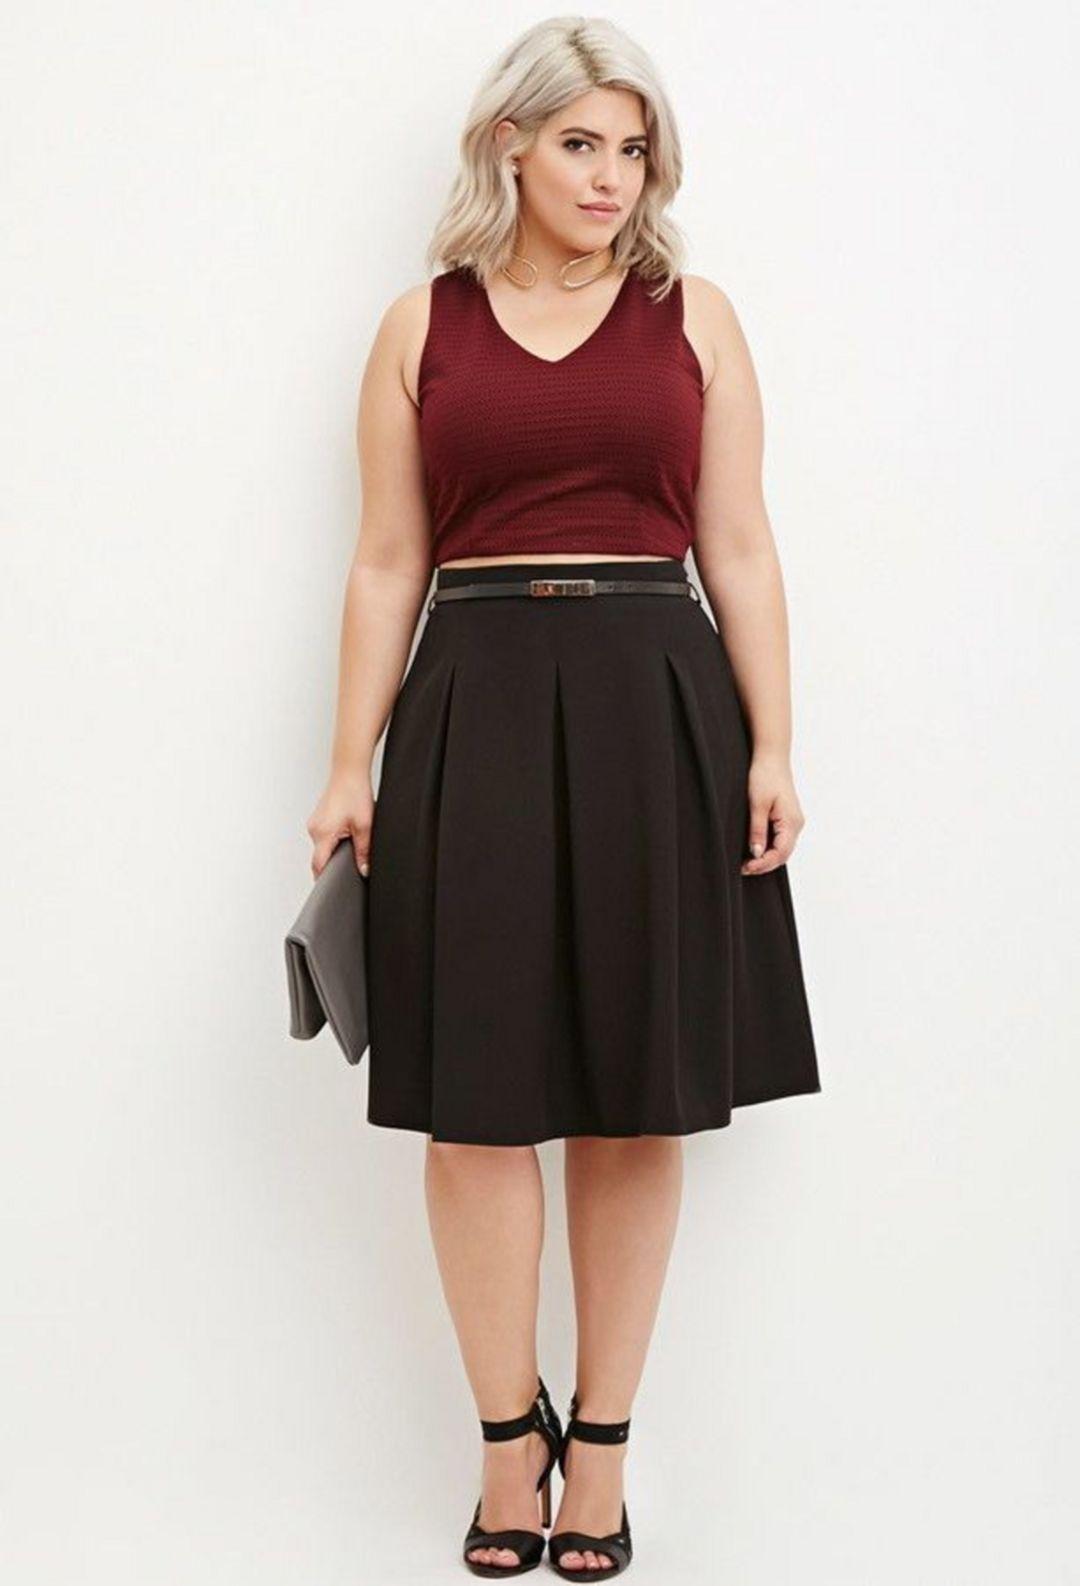 floral skirt 90s long XXL 50 big skirt long skirt XXL size buttons casual Plus size vintage women skirt floral buttoned plus size skirt